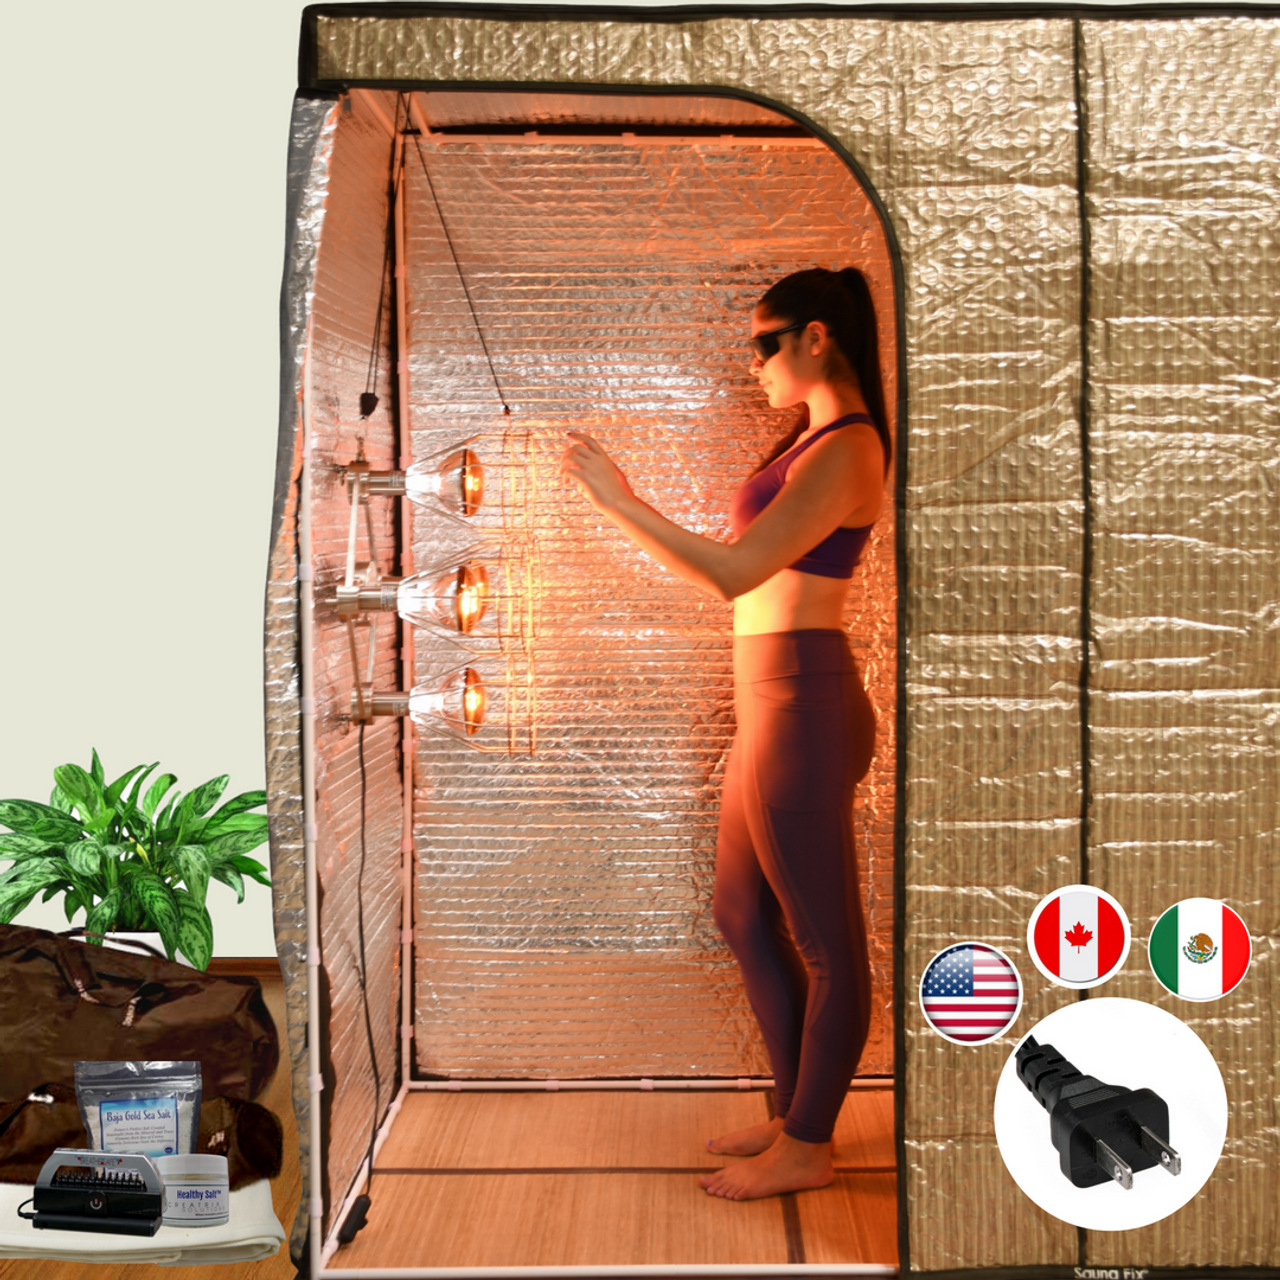 The Sauna Fix Hot Yoga Exercise Bundle tent sauna system includes the sauna  tent d37876c137fcd